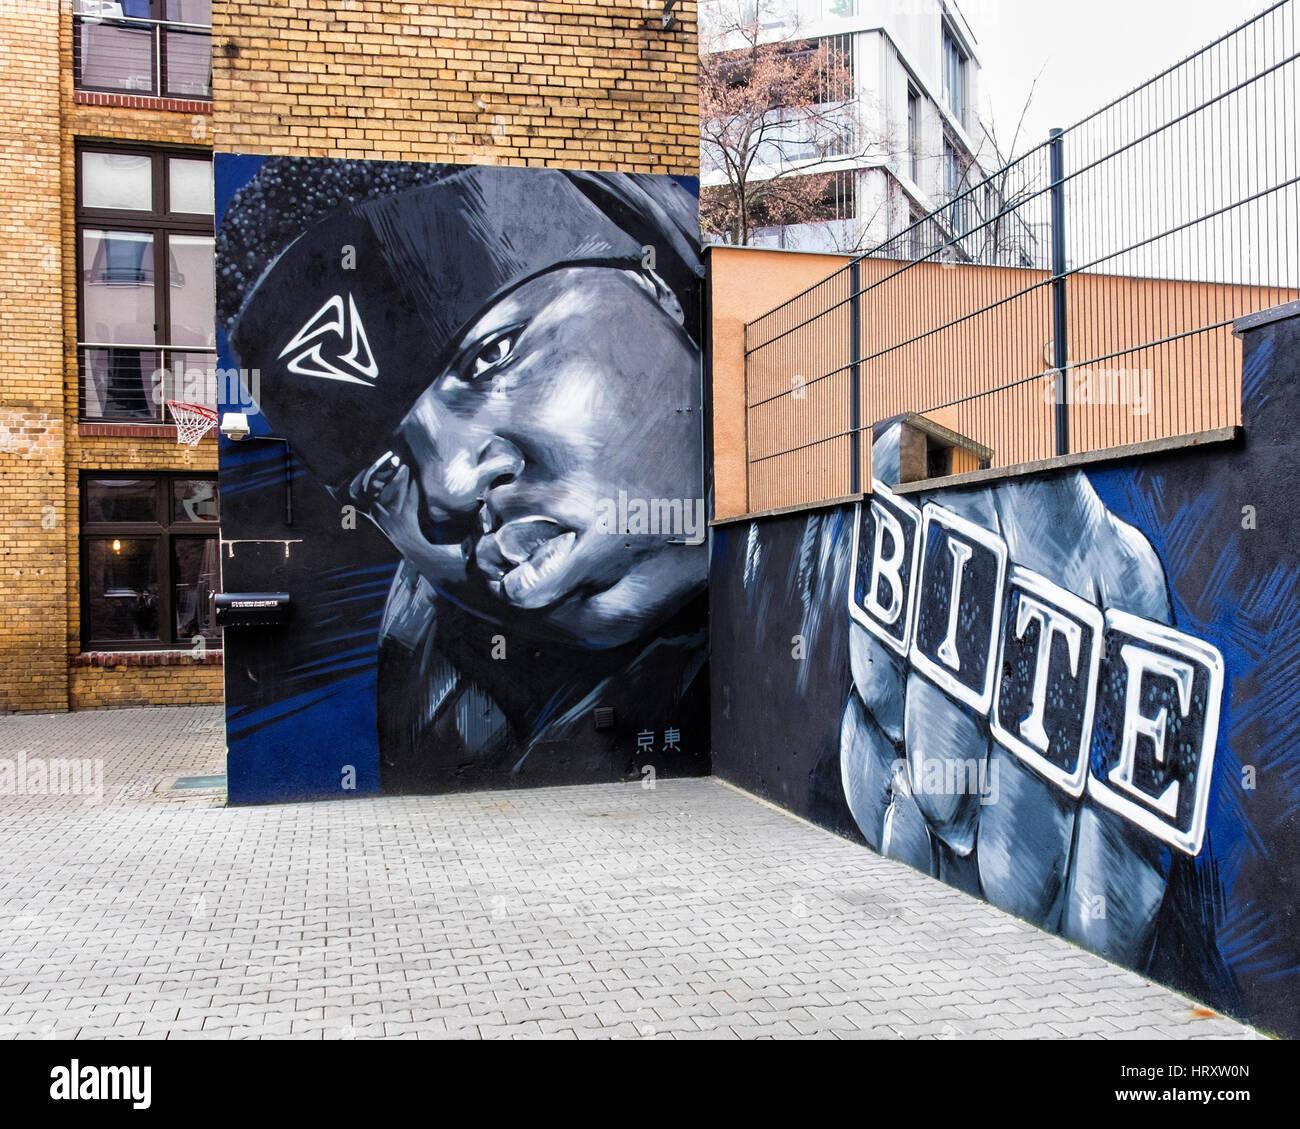 Berlin, Prenzlauer Berg. Mural artwork of black man outside Bite talent management agency in building courtyard Stock Photo